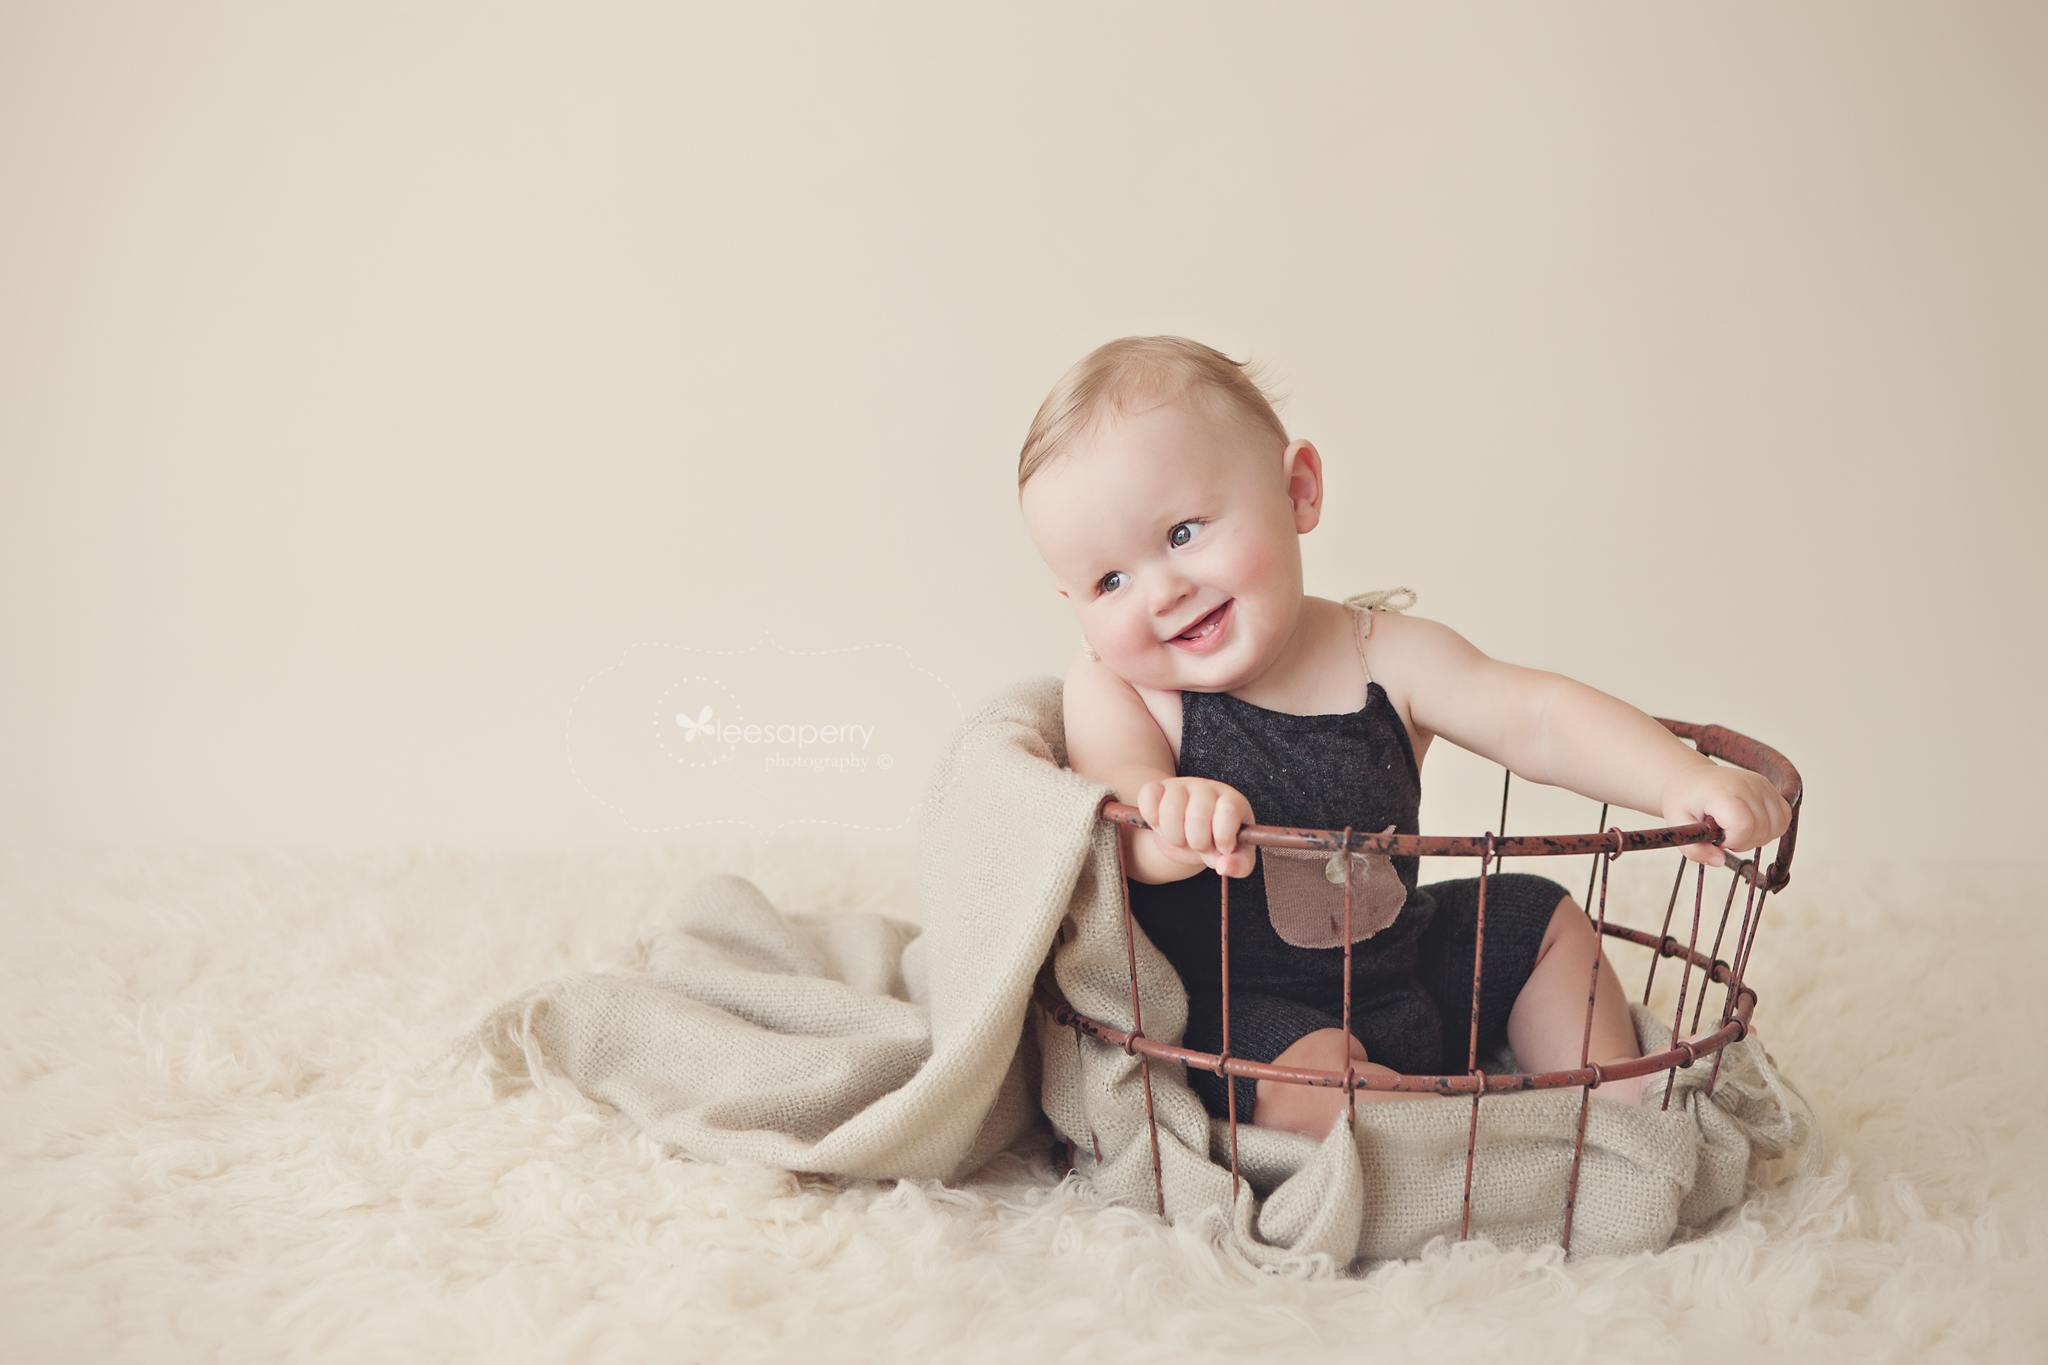 brisbane baby photographer, baby photographer brisbane